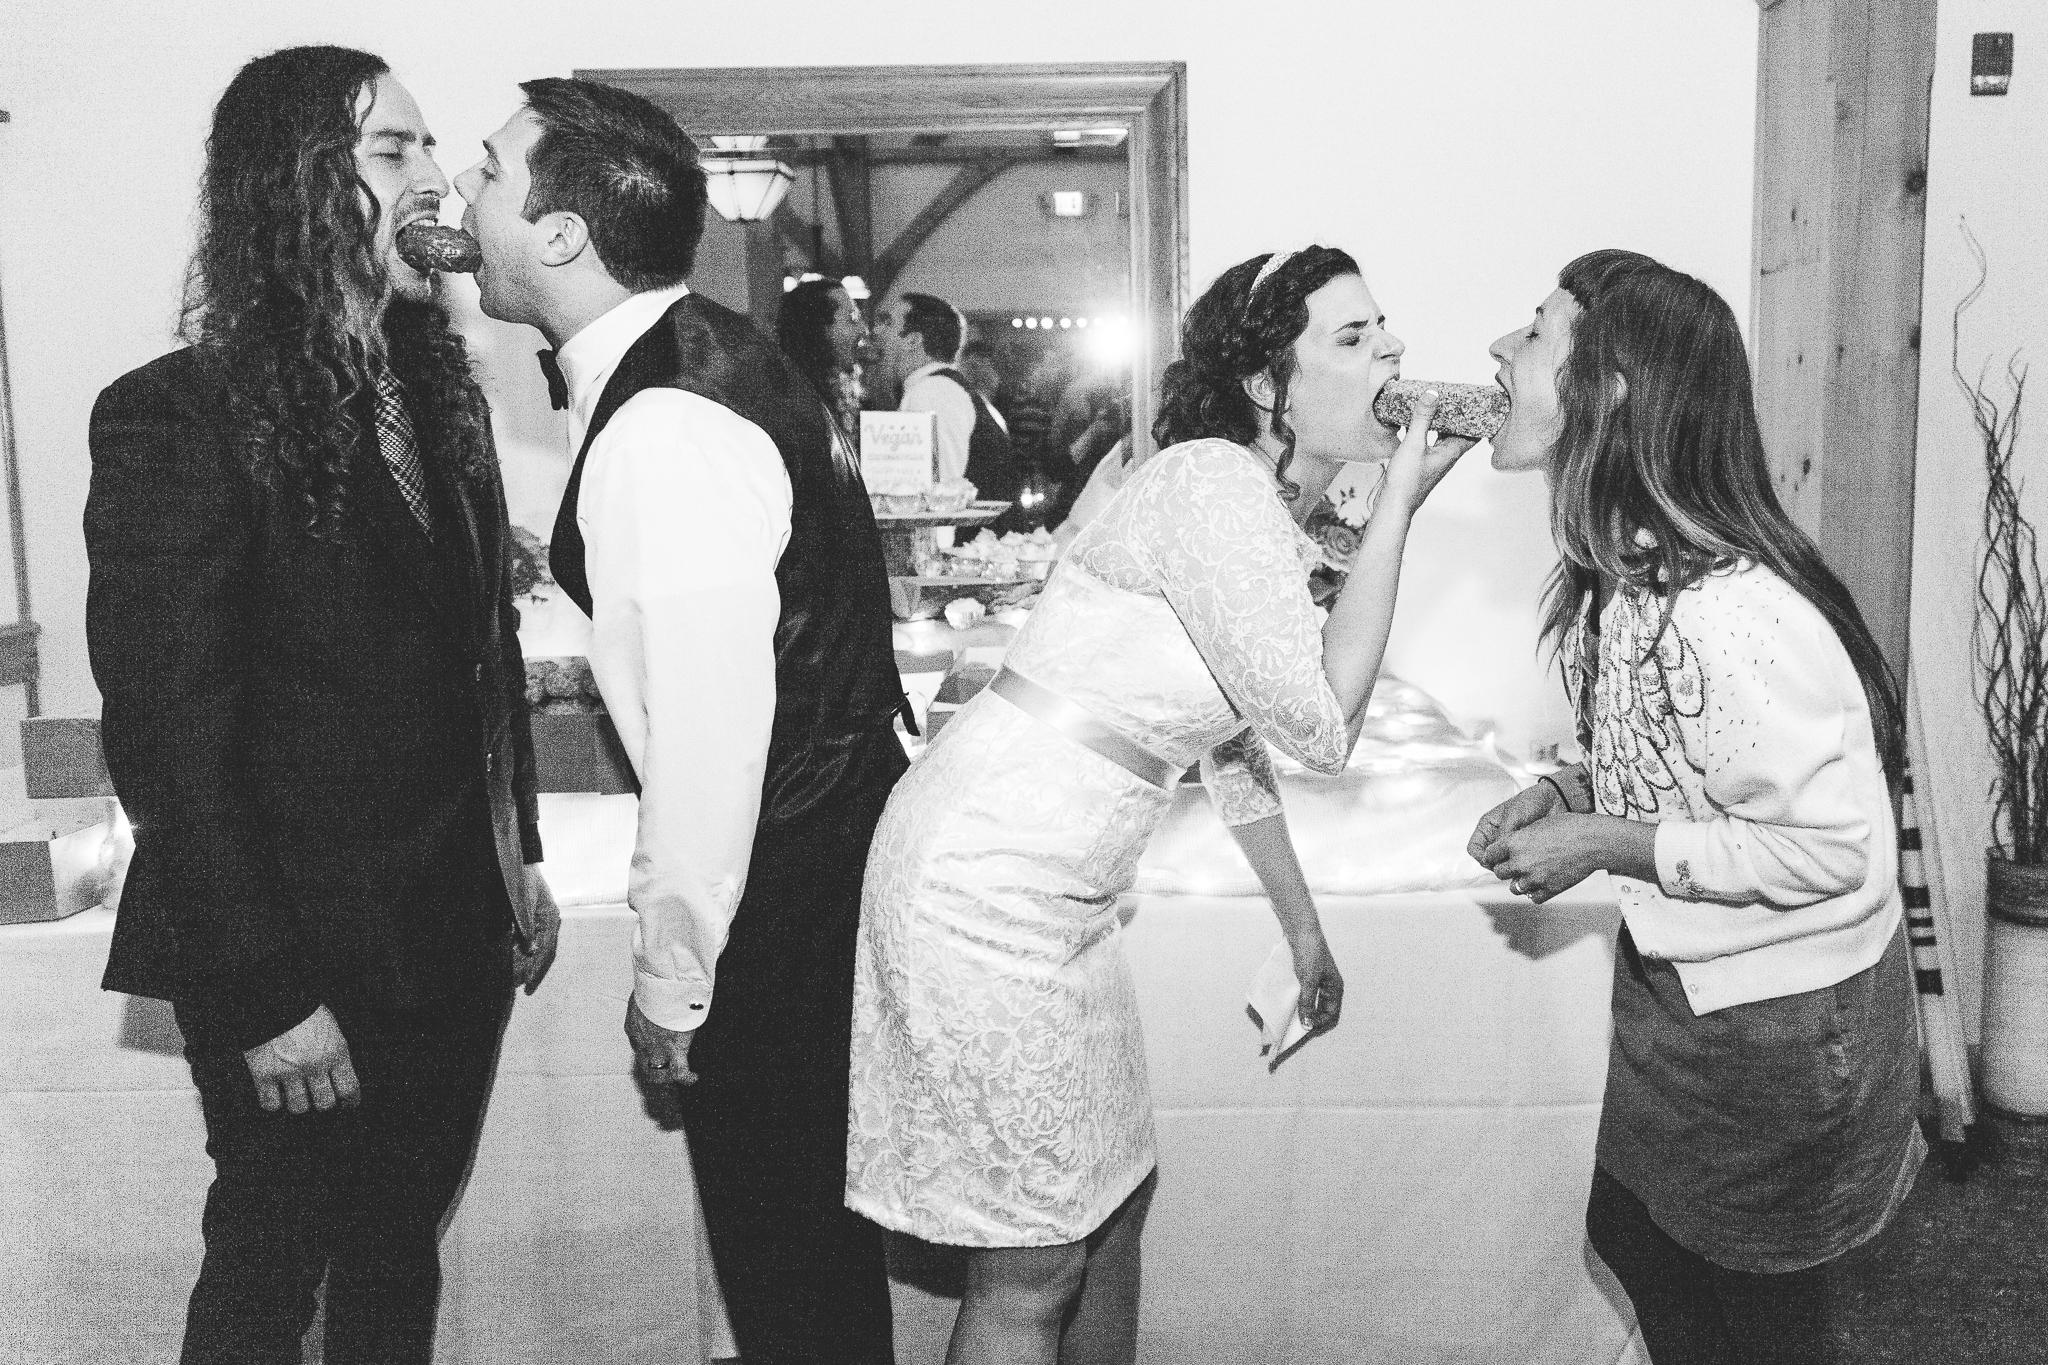 camuglia-whomstudio-chelsea_and_andy-nycphotographer-wedding-brooklyn-buffalo-timberlodge-169-1102.jpg